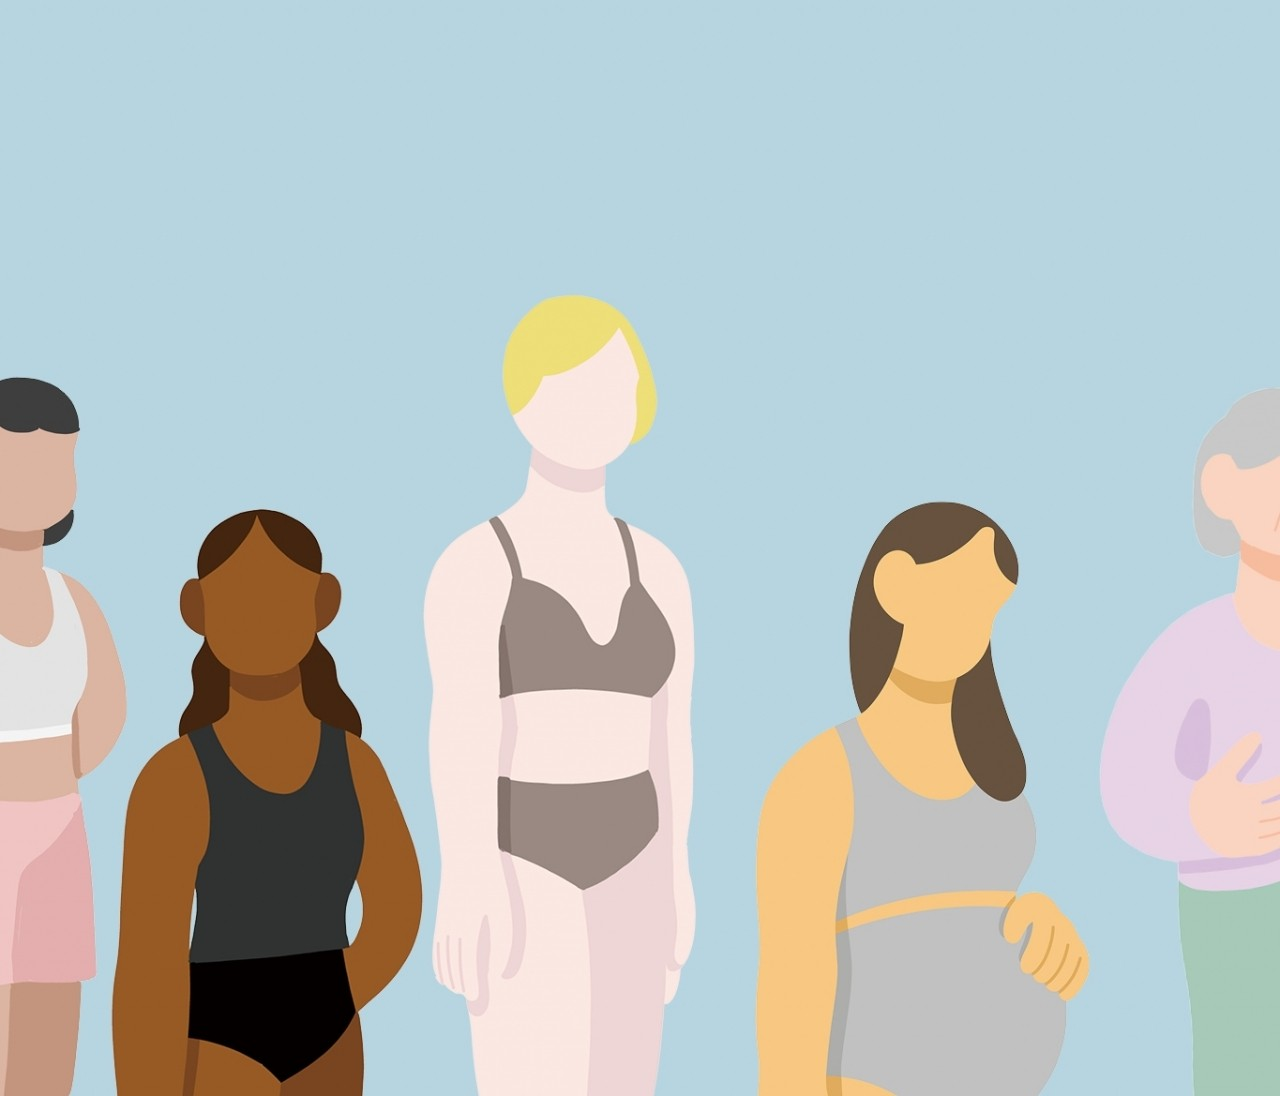 【UNIQLO(ユニクロ)】エアリズム吸水サニタリーショーツ¥1990が登場!女性に寄り添うフェムテックアイテムが大充実